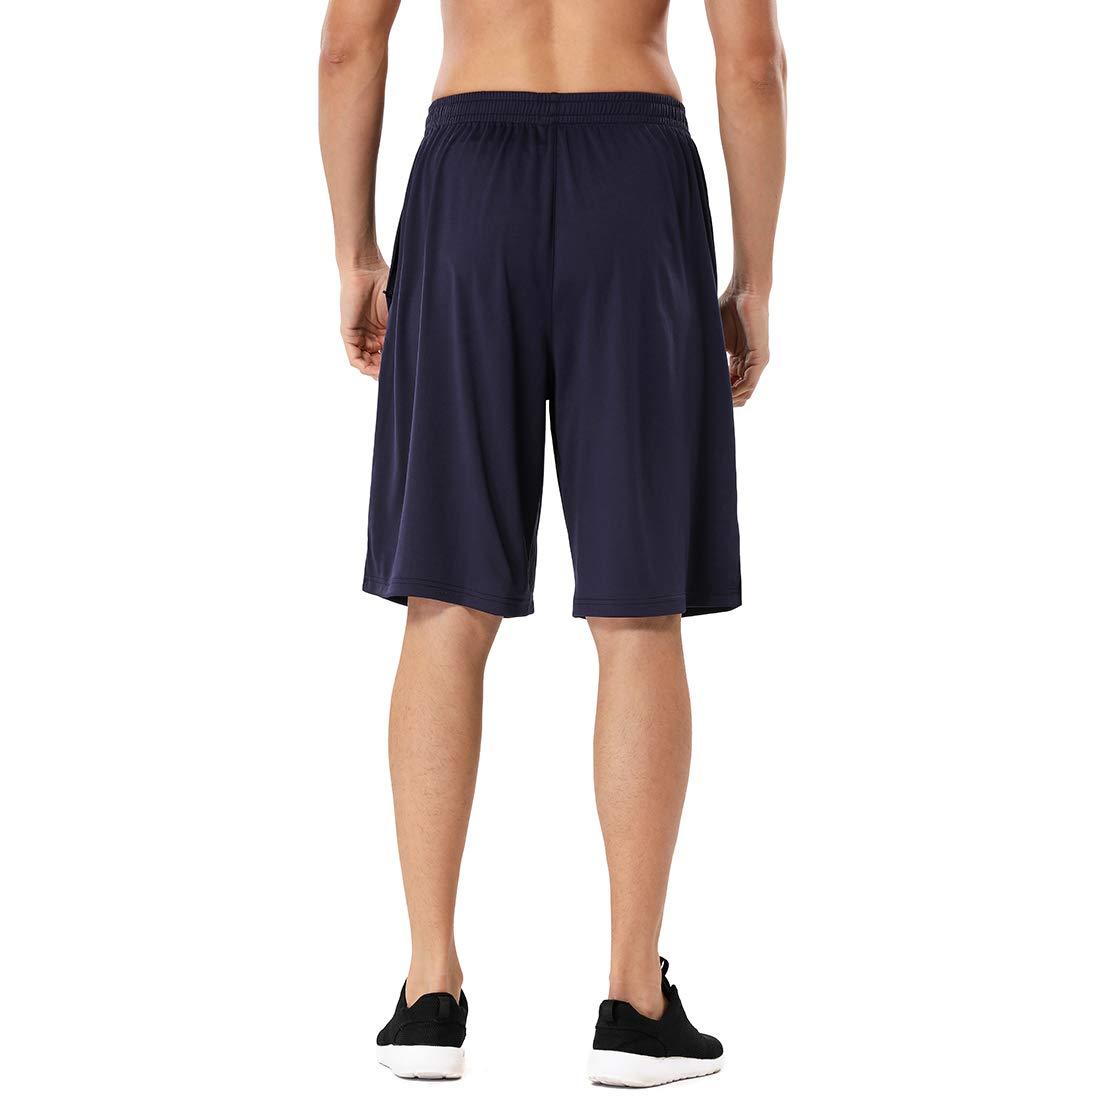 Devoropa Mens Athletic Basketball Shorts Loose-Fit Performance Sports Workout Shorts Zipper Pockets